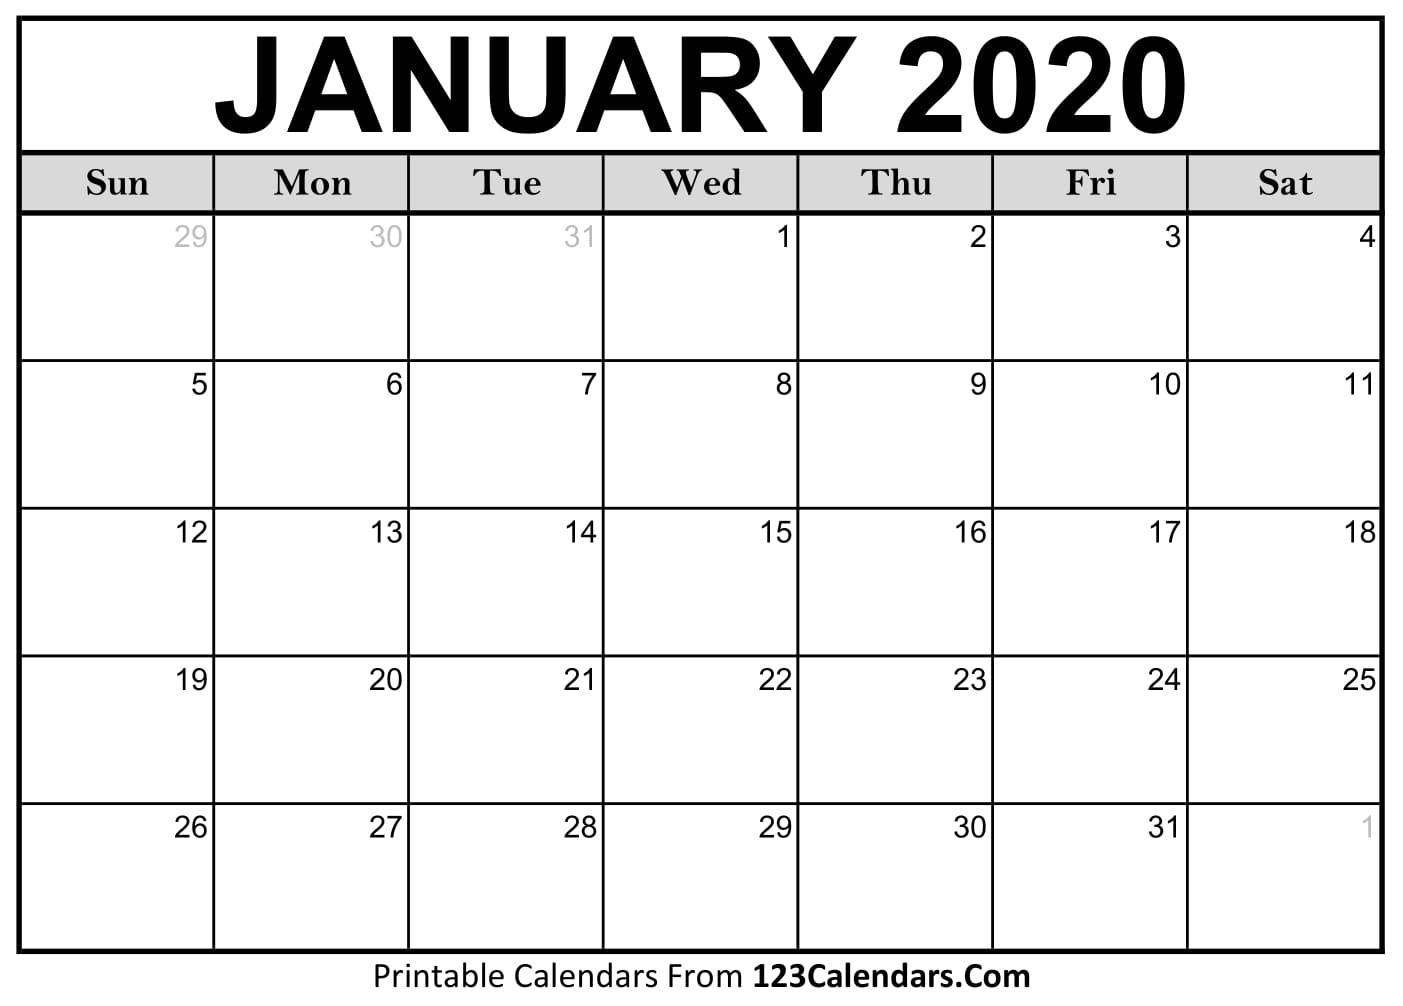 Printable Fill In Calendar For 2020 - Calendar Inspiration